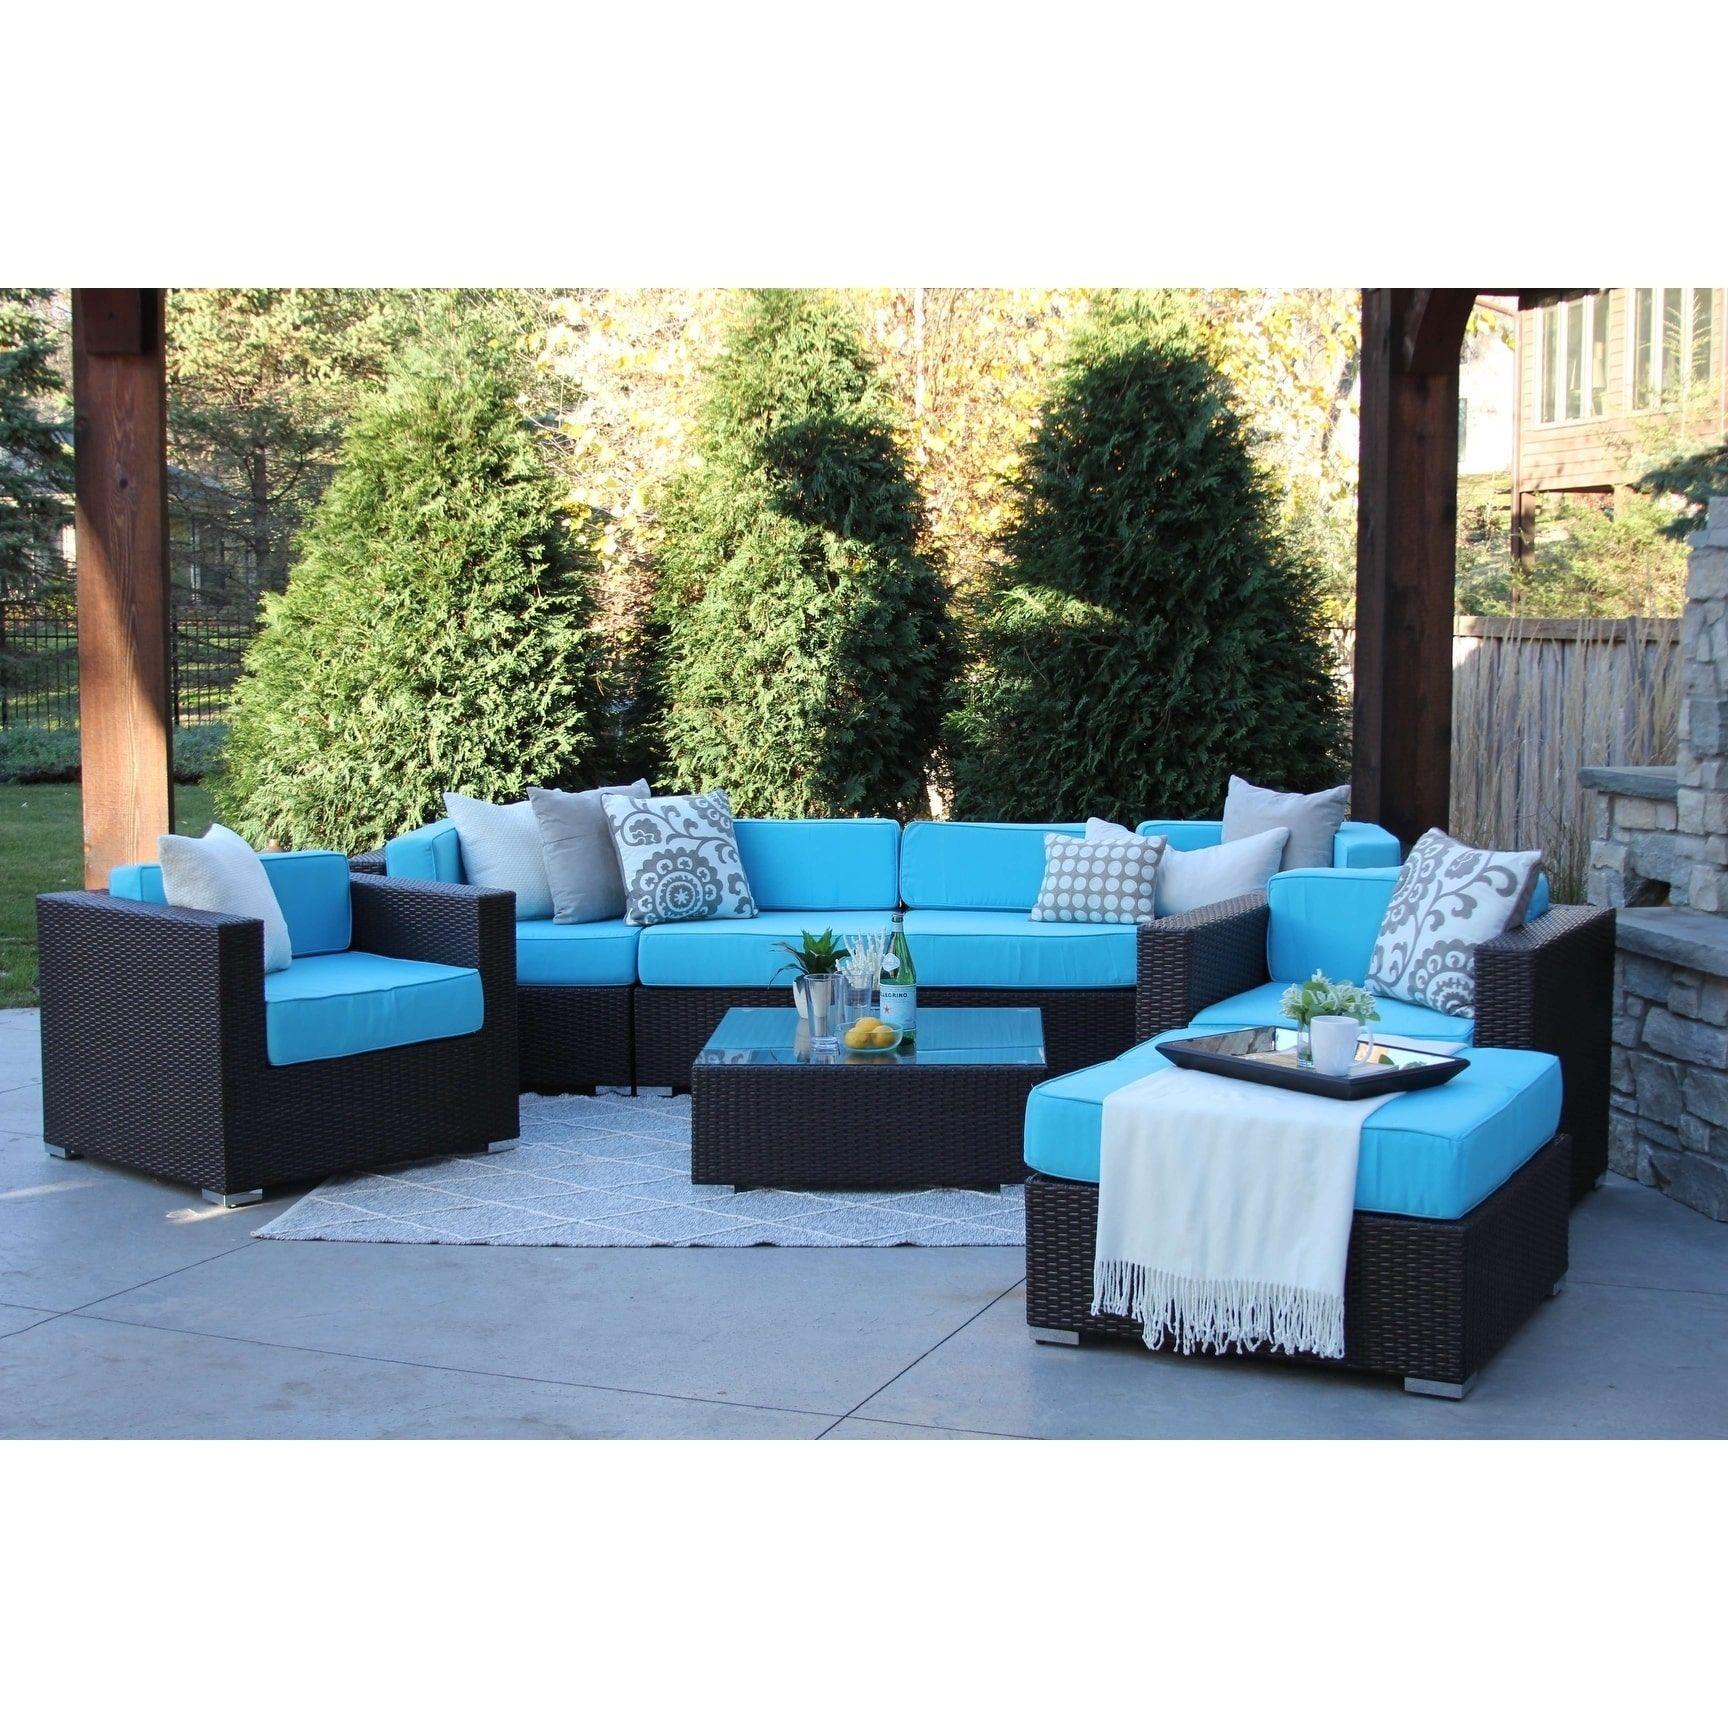 Hiawatha 8 pc modern outdoor rattan patio furniture sofa set modular